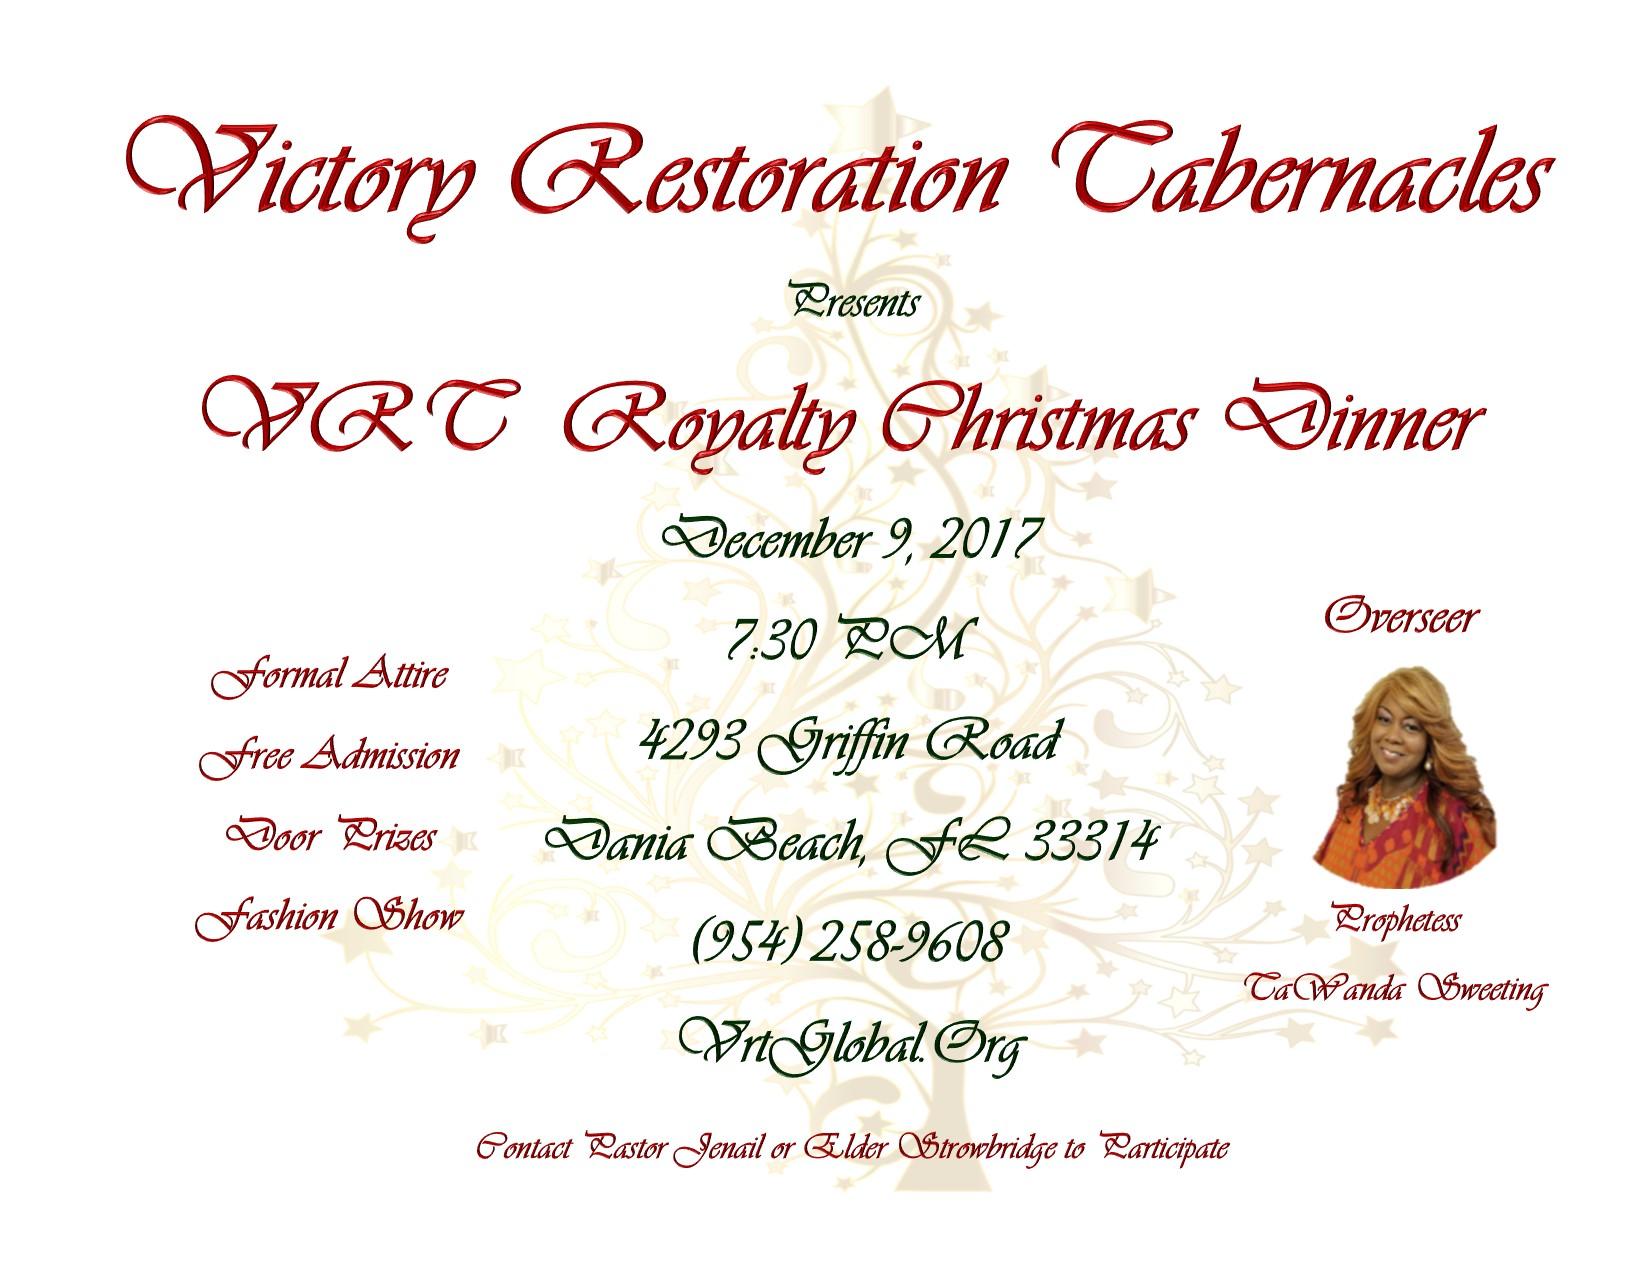 Christmas Dinner Prayer.Royal Christmas Dinner Victory Restoration Tabernacles Inc